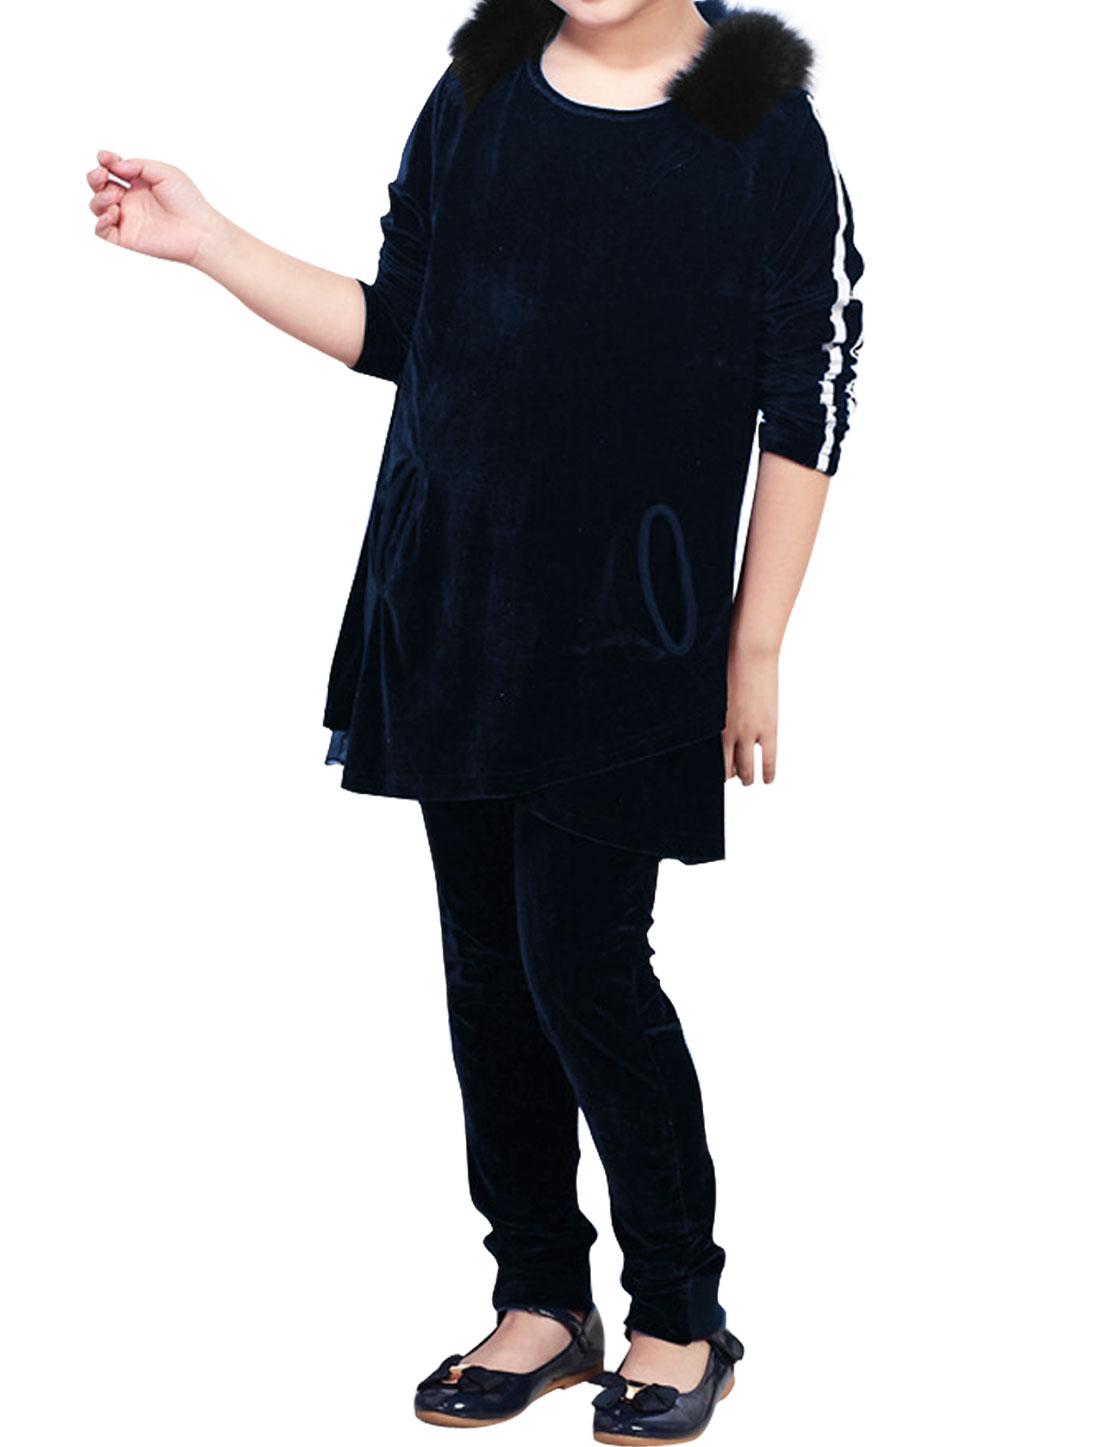 Fashion Dark Blue Faux Fur Decor Velvet Top w Pants Set for Girl 6X